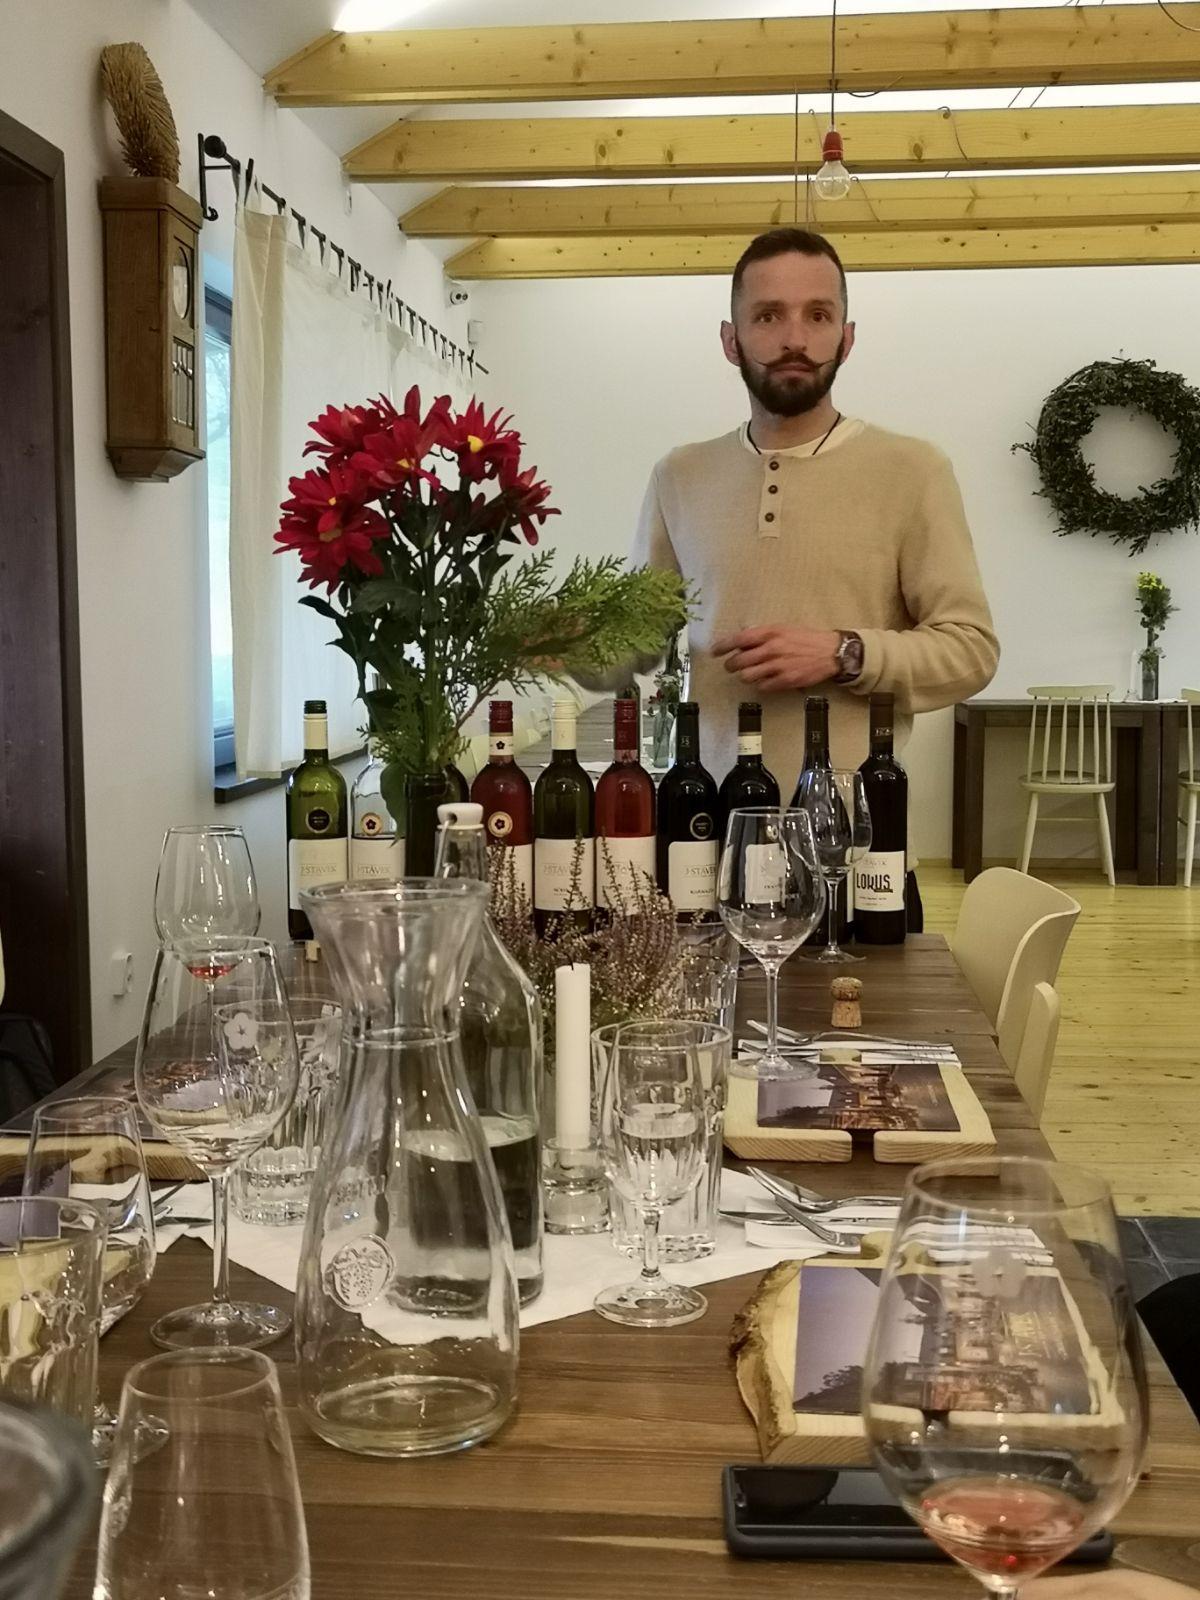 jstavek winiarnia